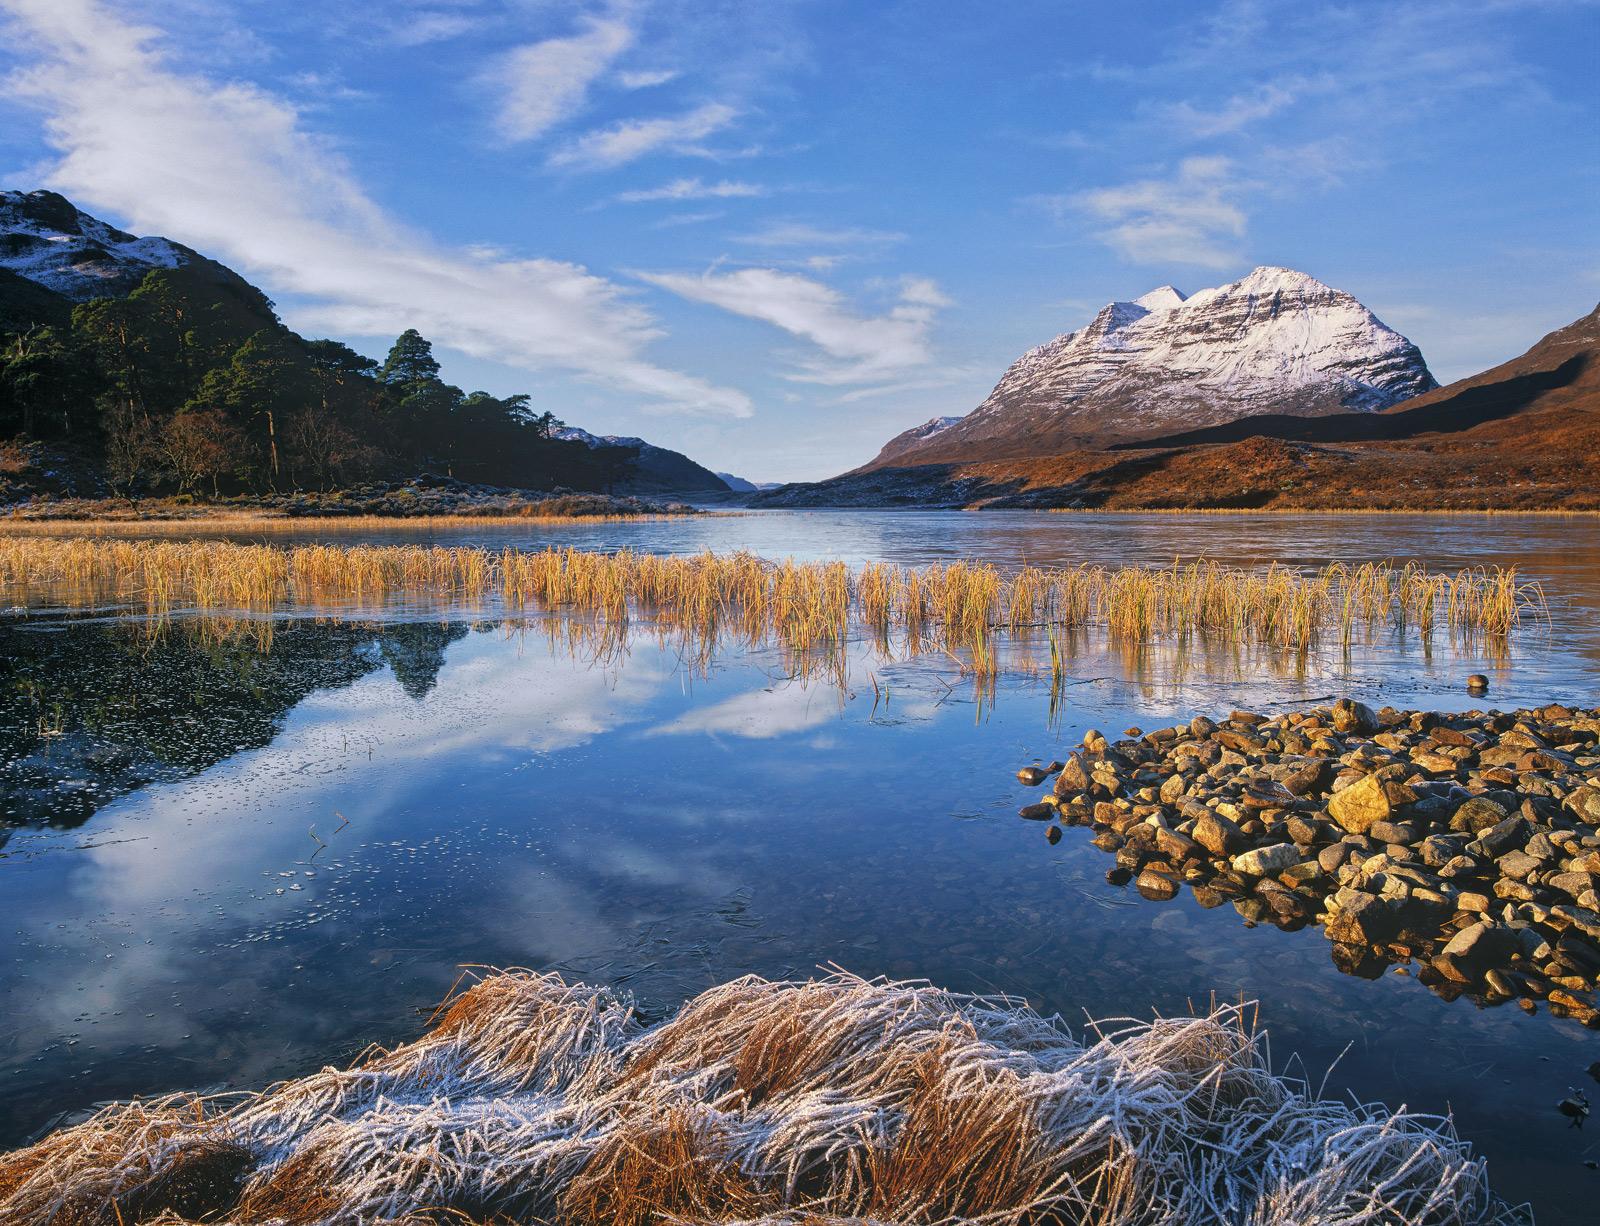 Winter's Breath Loch Clair, Loch Clair, Torridon, Scotland, perfect, winter, dawn, crispy, jacket, Liathach, golden, ree, photo